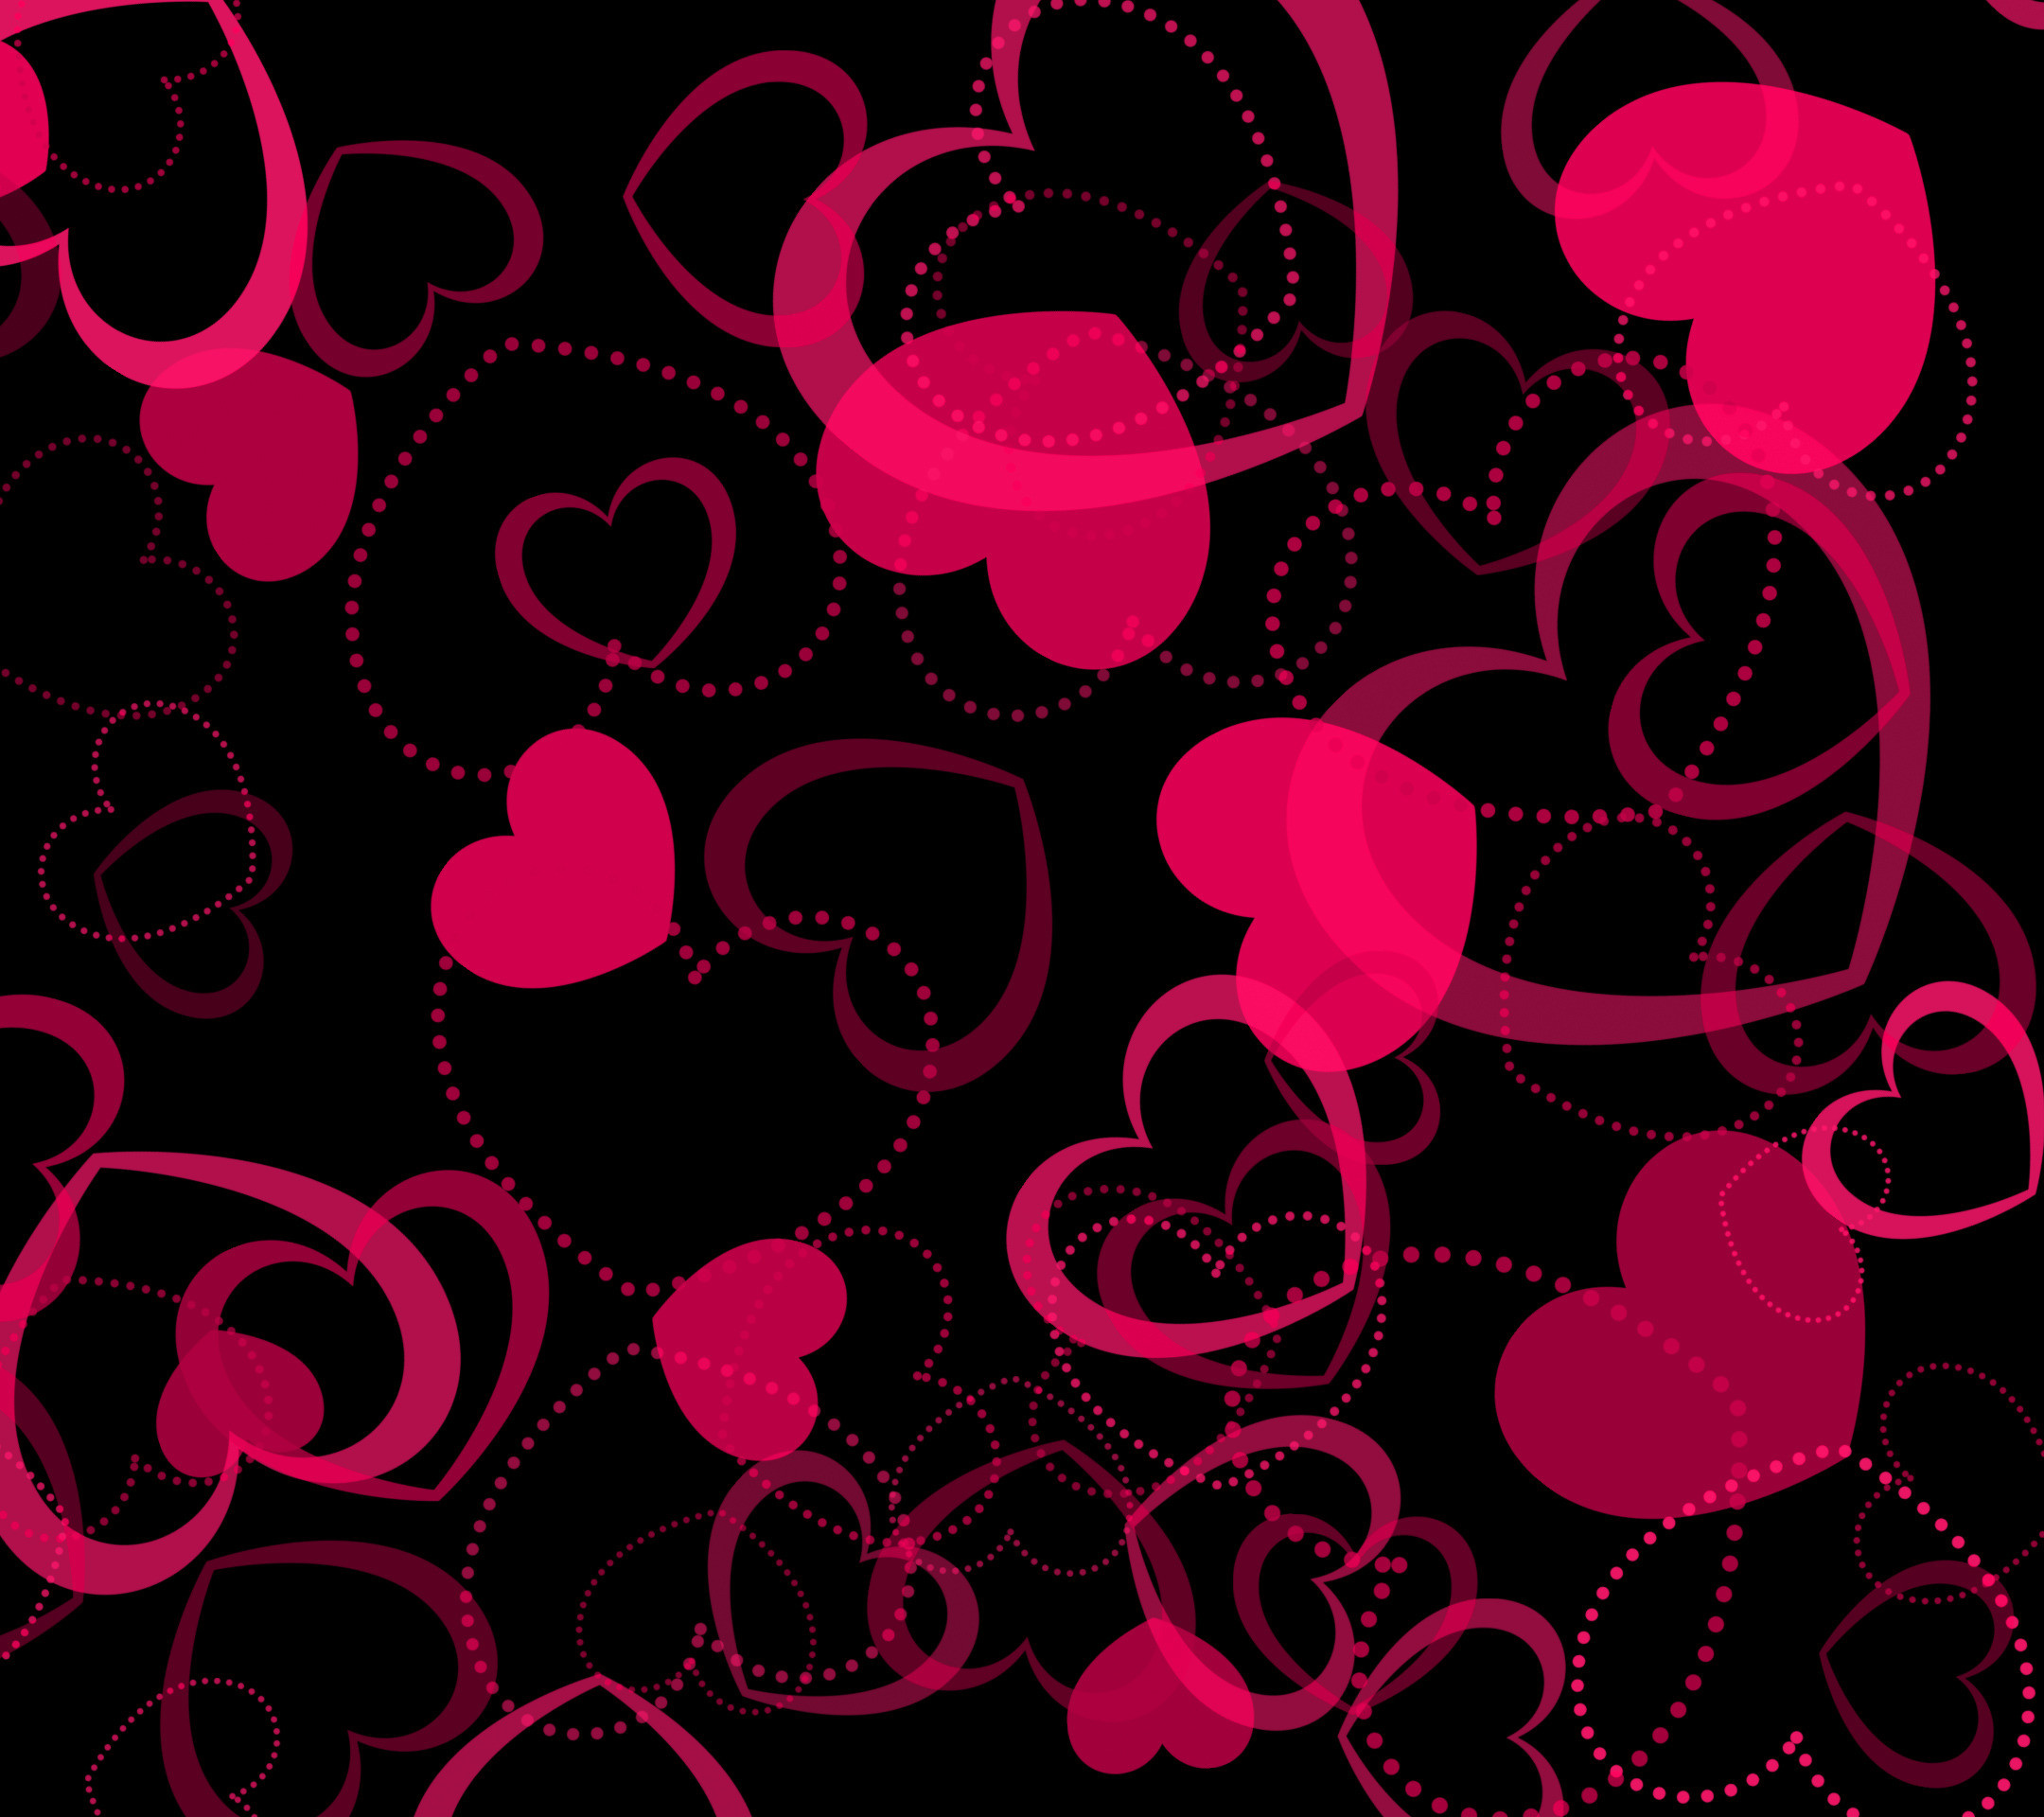 Pink Heart Wallpaper 75 Images